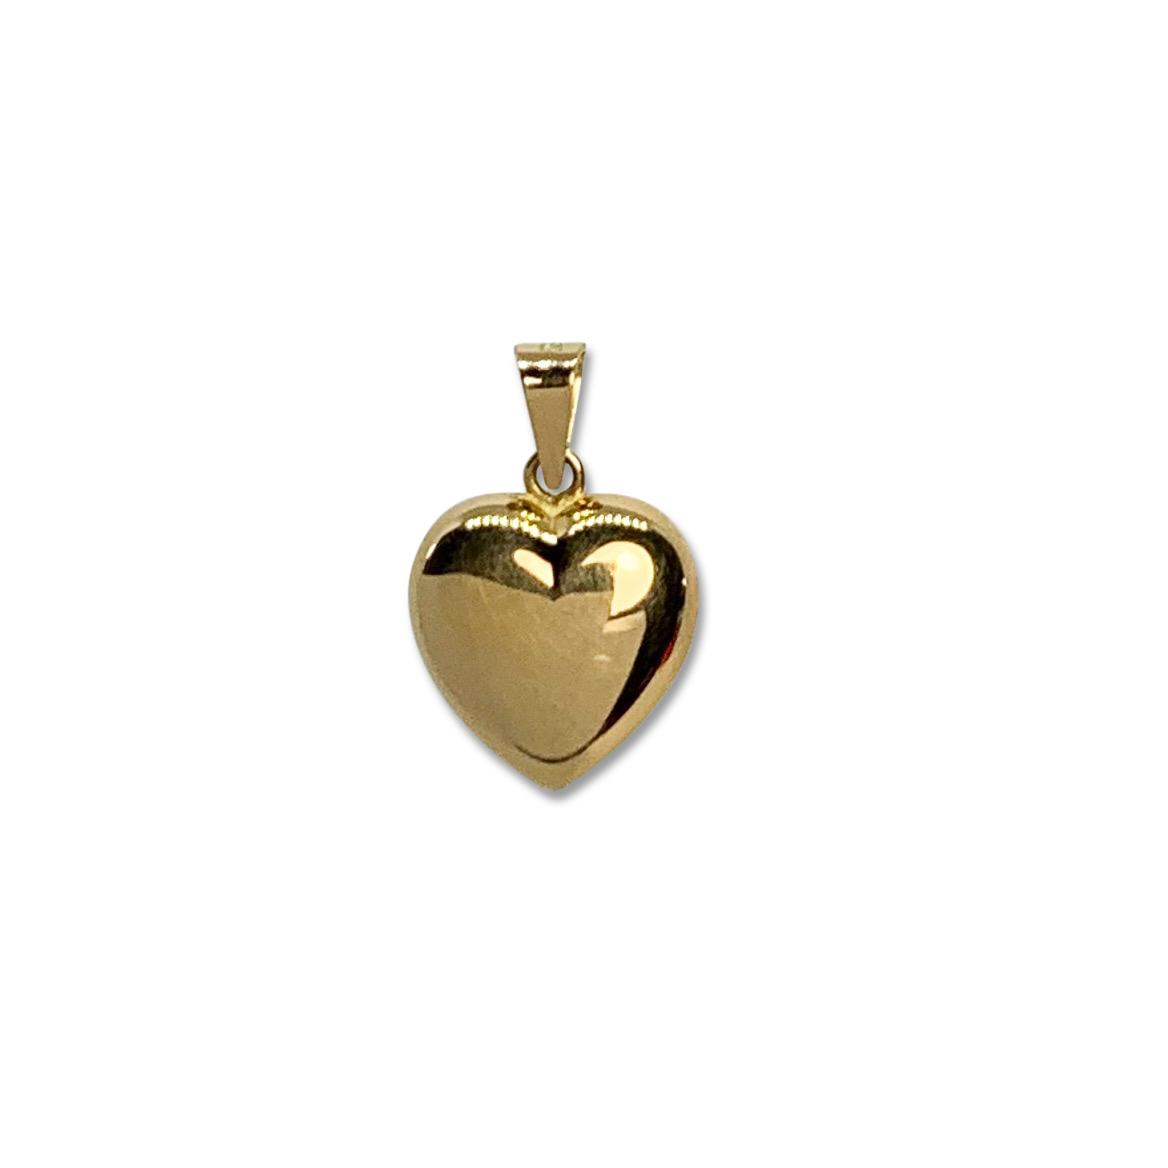 Hänge Hjärta Guld